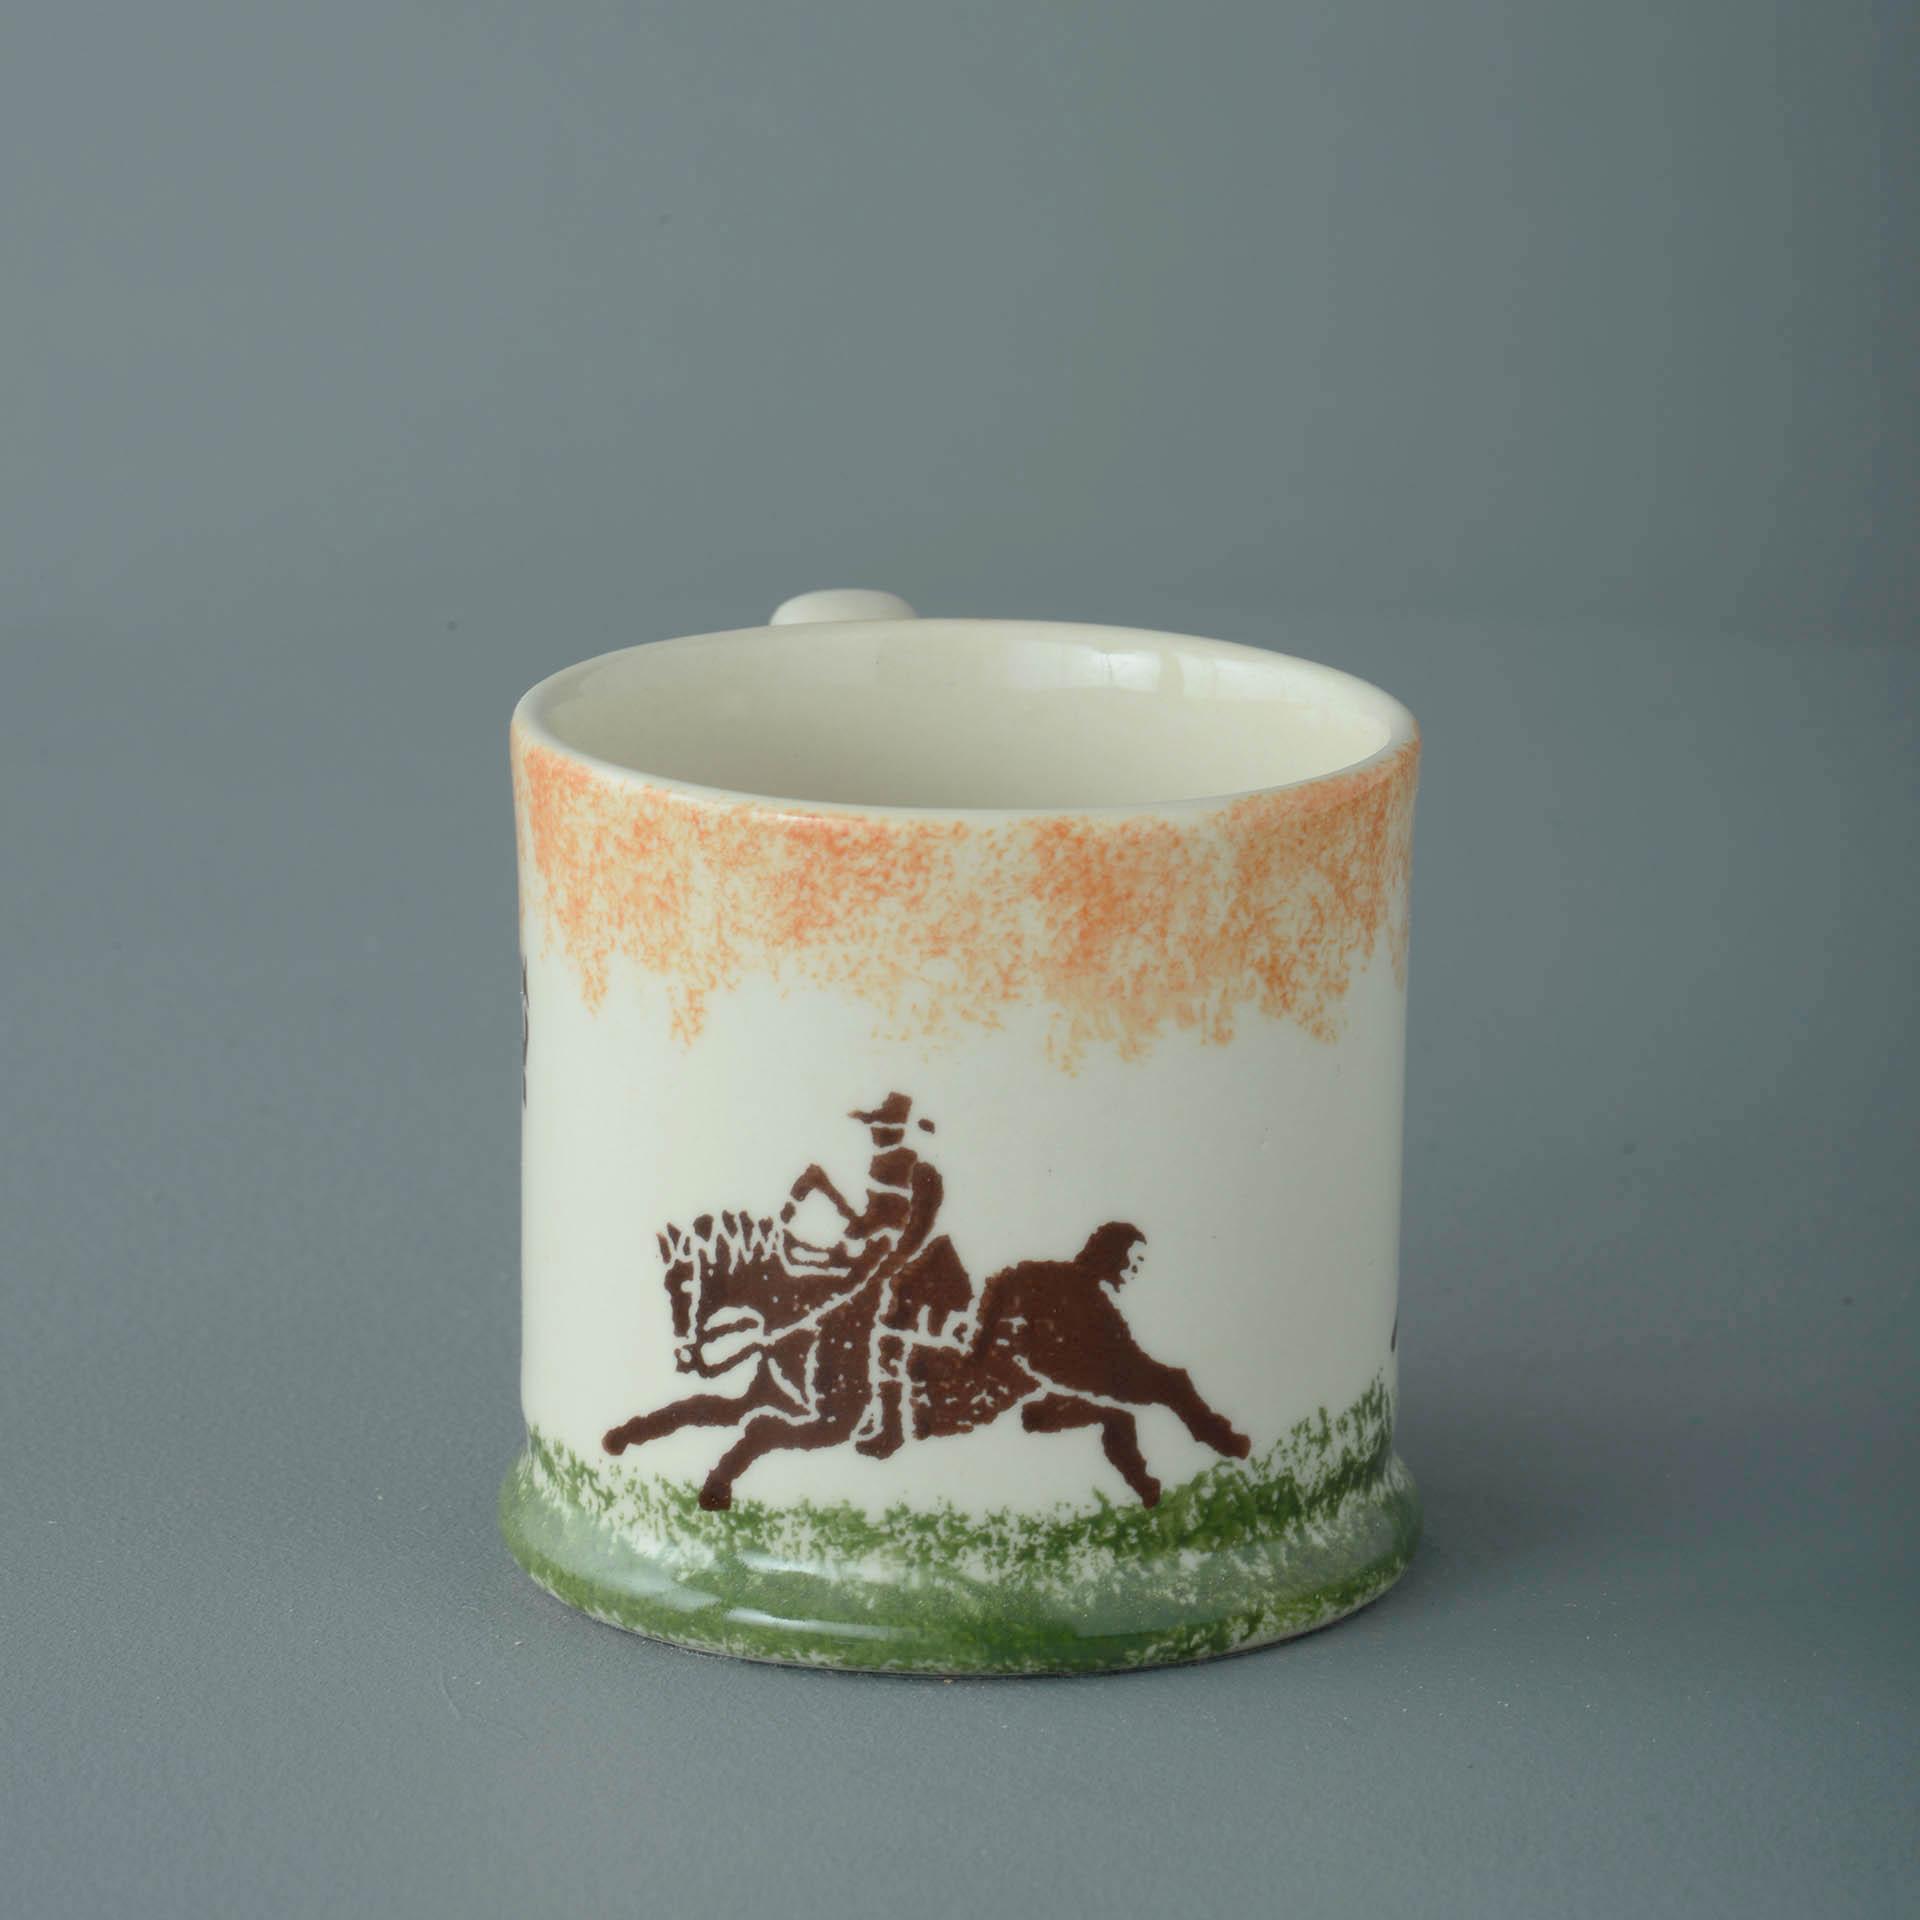 Cowboy and Farrier 150ml Small Mug 7 x 7.3cm